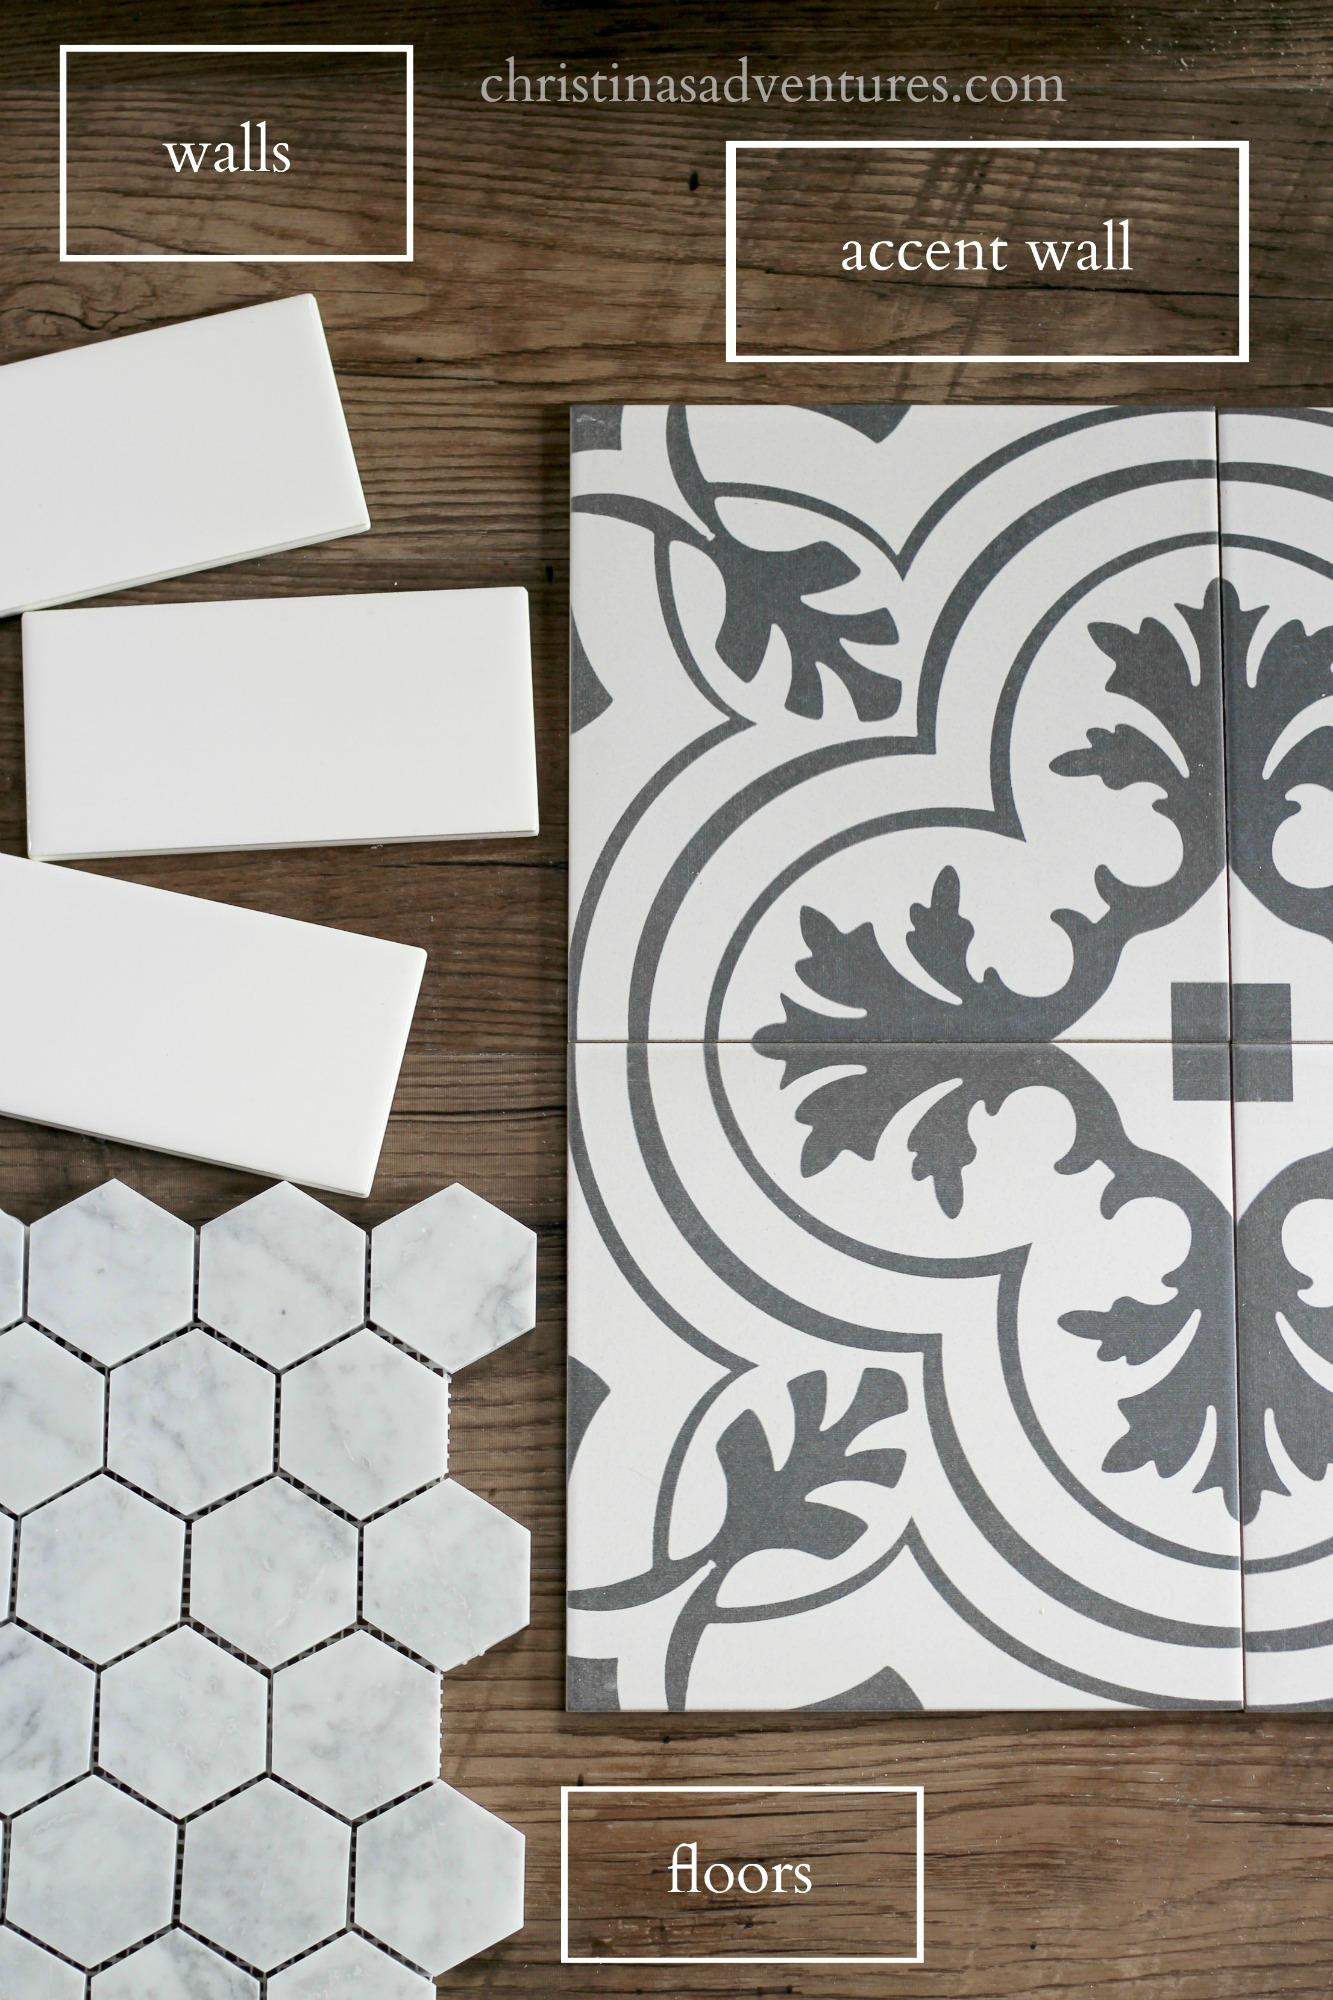 Affordable bathroom tile designAffordable bathroom tile designs   Christinas Adventures. Discount Bathroom Tile. Home Design Ideas